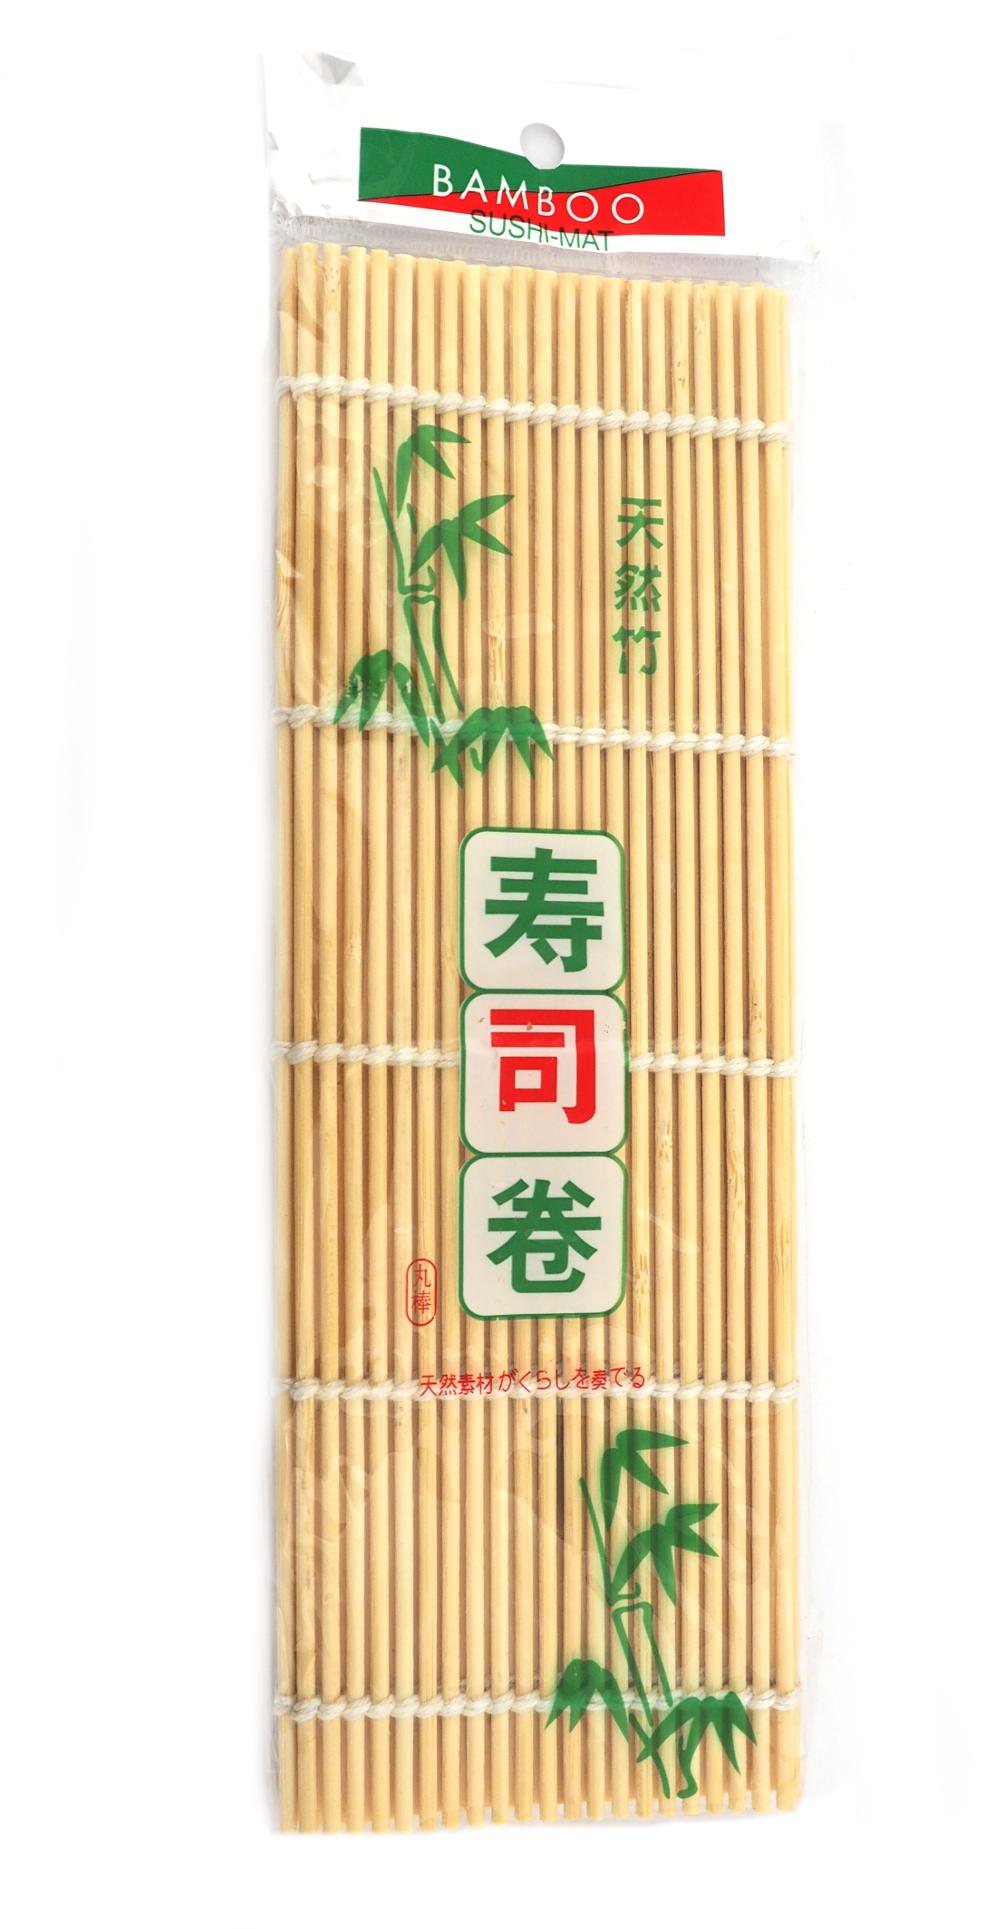 [WO] Mata do sushi, rozmiar 24x24cm okrągły bambus